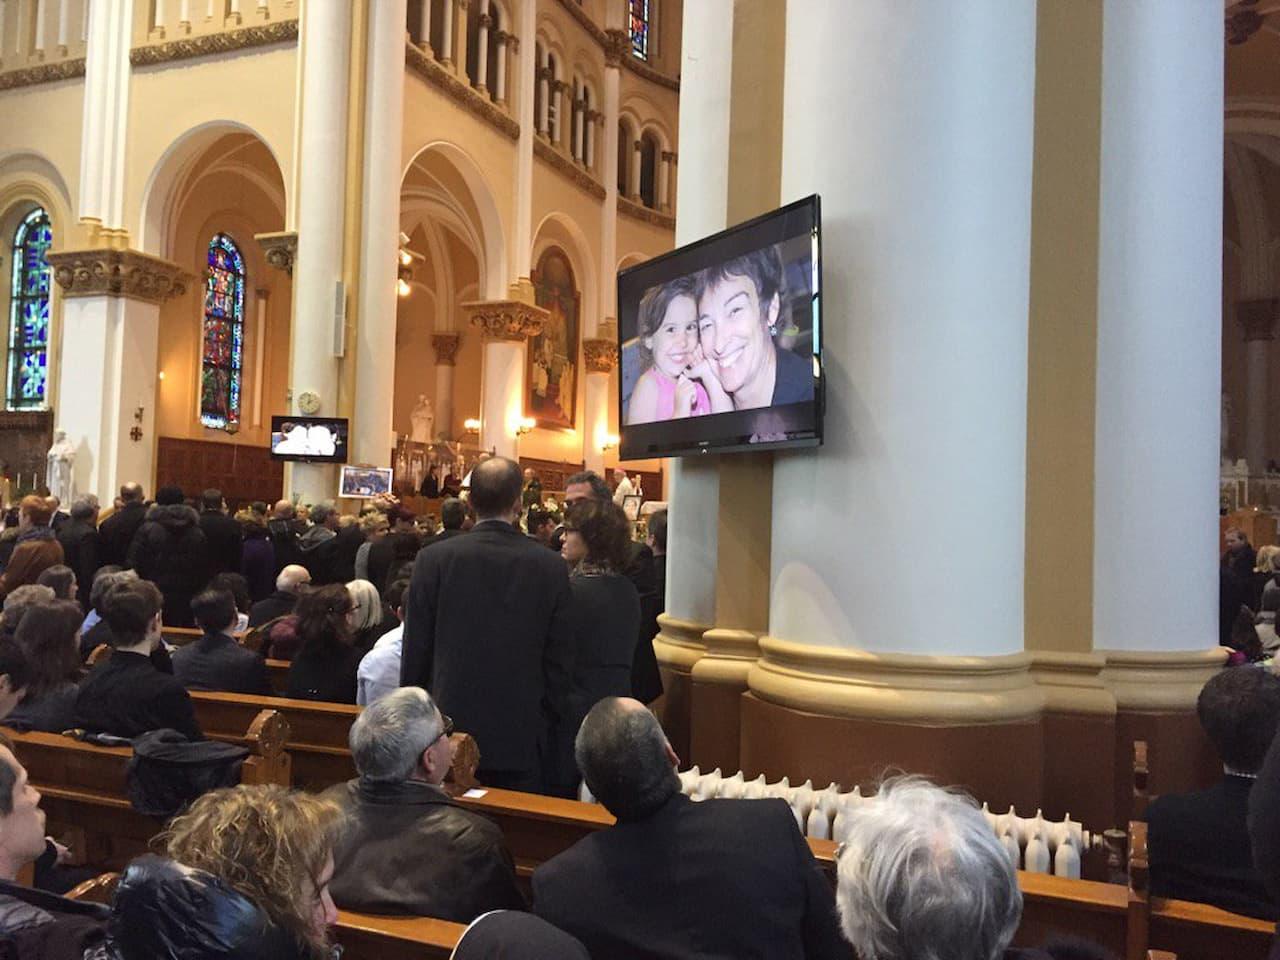 tv in church